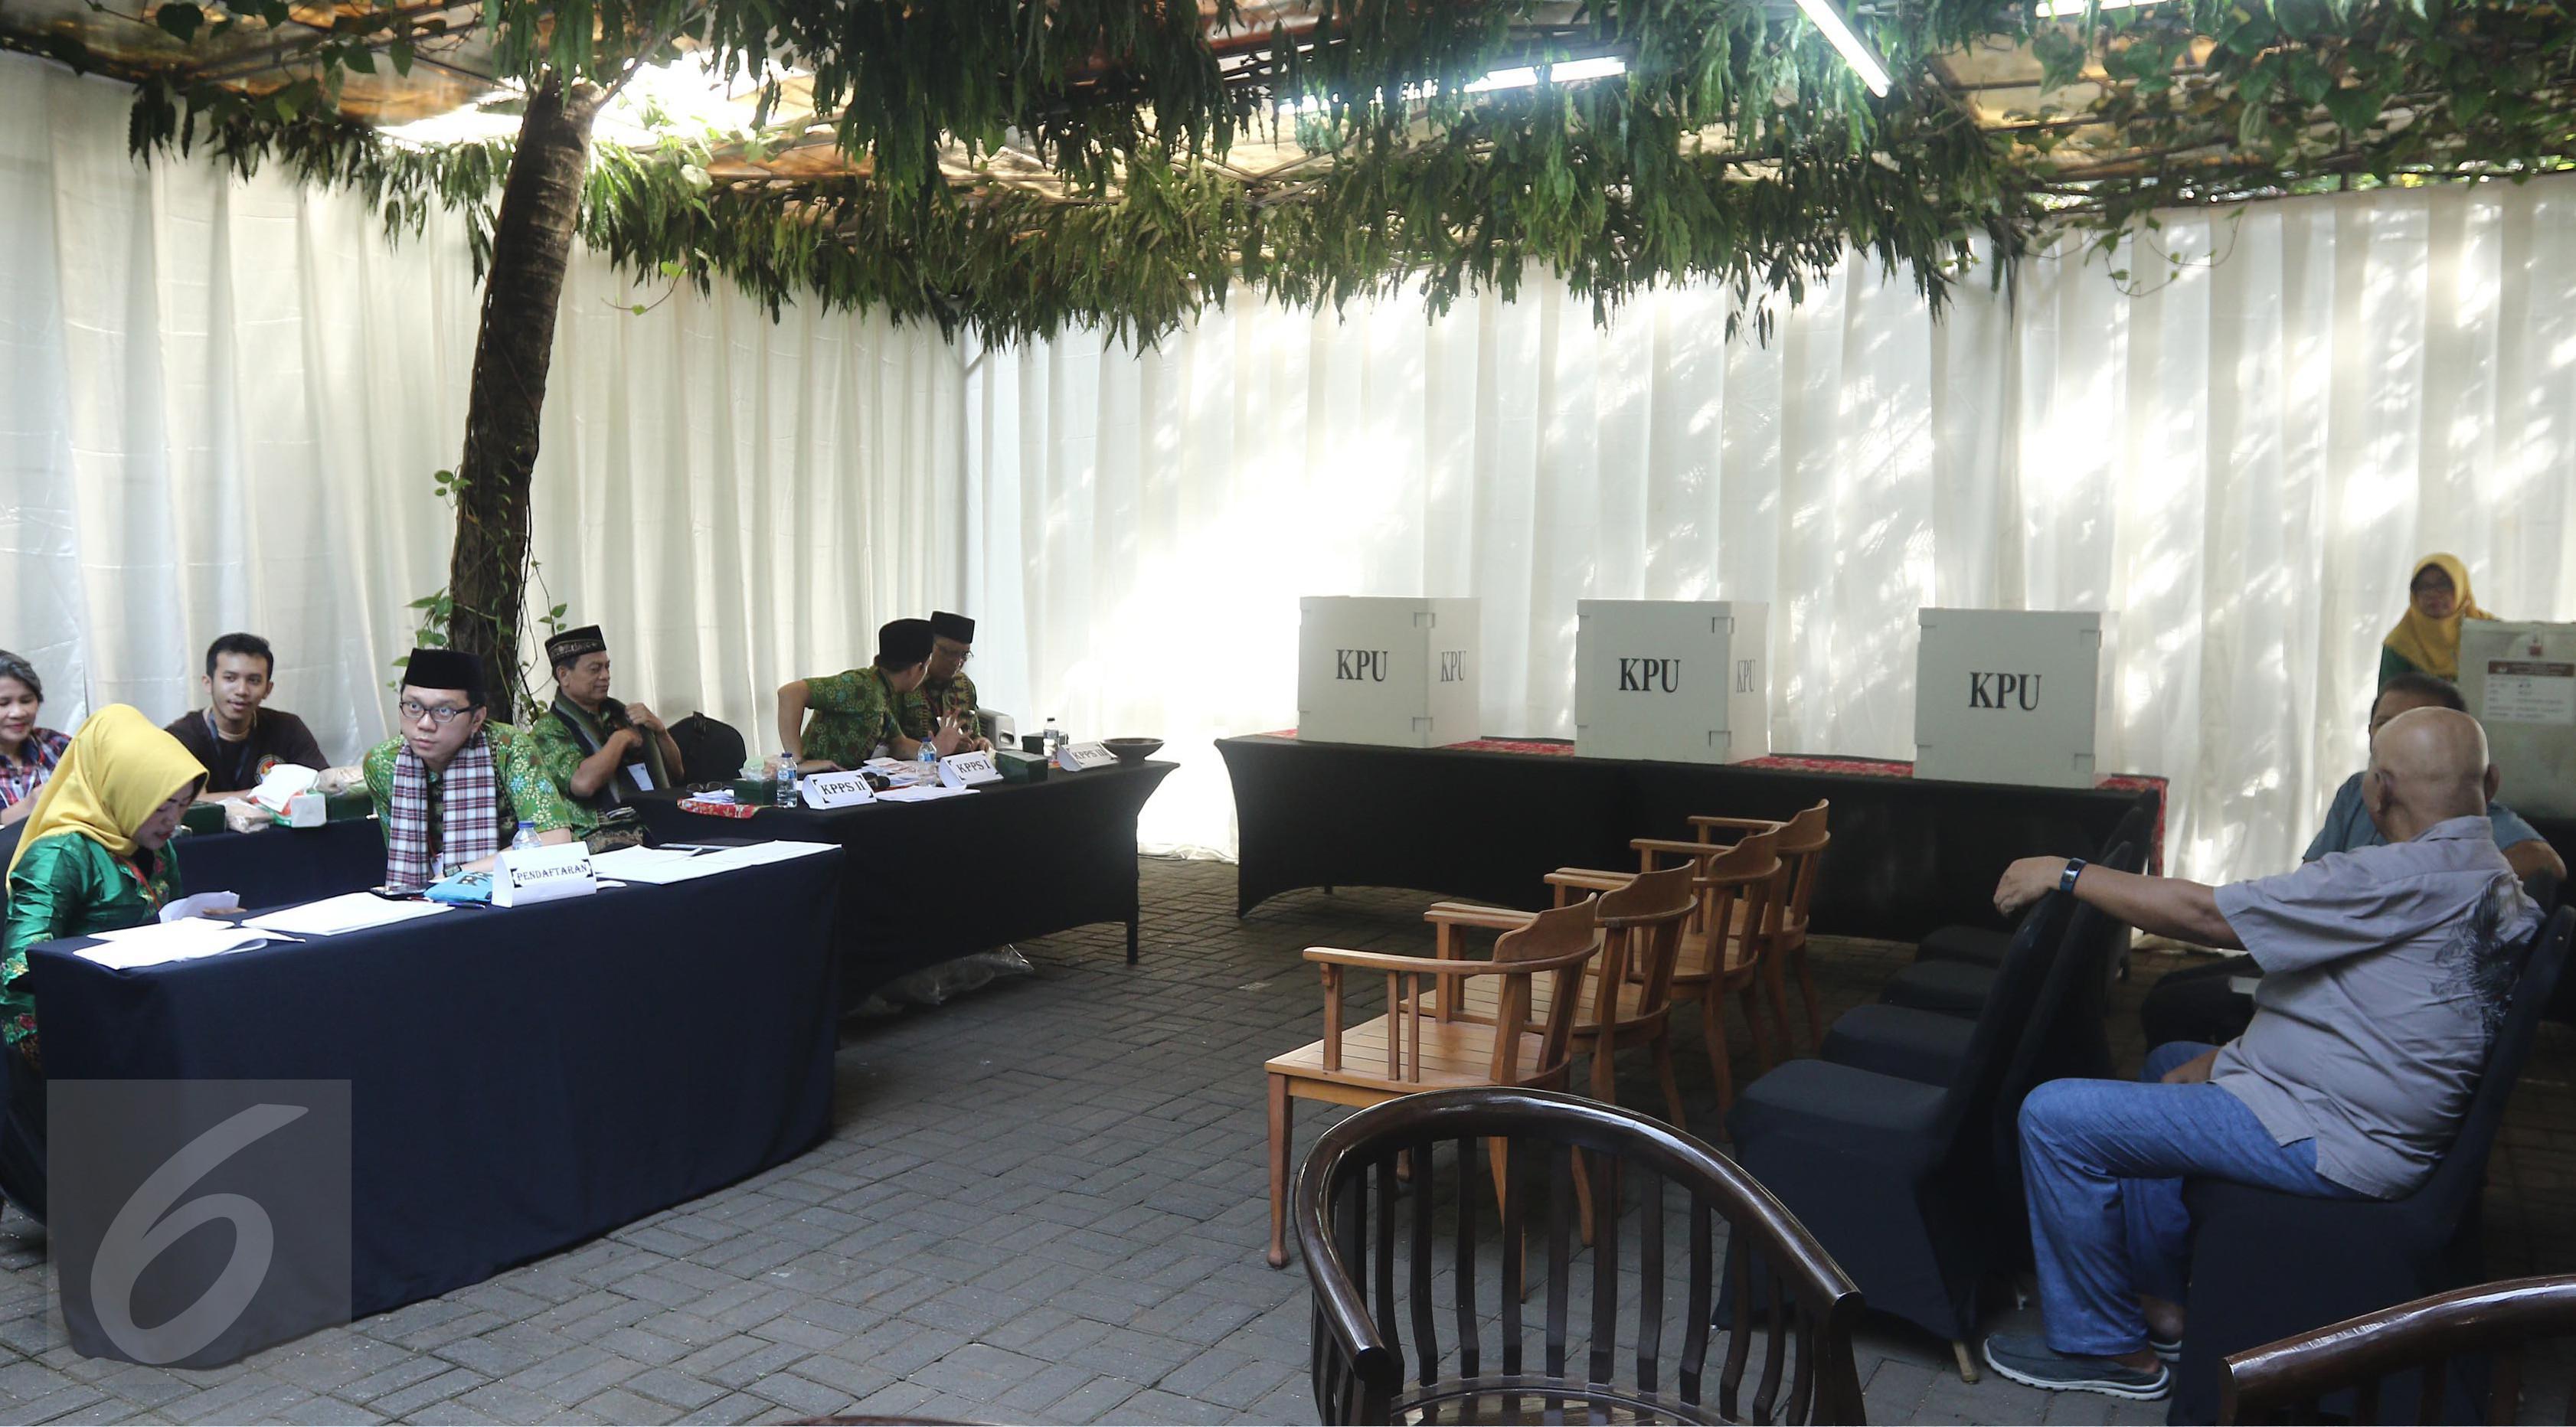 Petugas KPPS menunggu warga yang akan menggunakan hak pilihnya pada pilkada DKI 2017 di TPS 03, Kelurahan Pulo, Jakarta Selatan, Rabu (19/4). TPS dekat kediaman pribadi Wapres Jusuf Kalla ini didekorasi dengan gaya betawi. (Liputan6.com/Herman Zakharia)